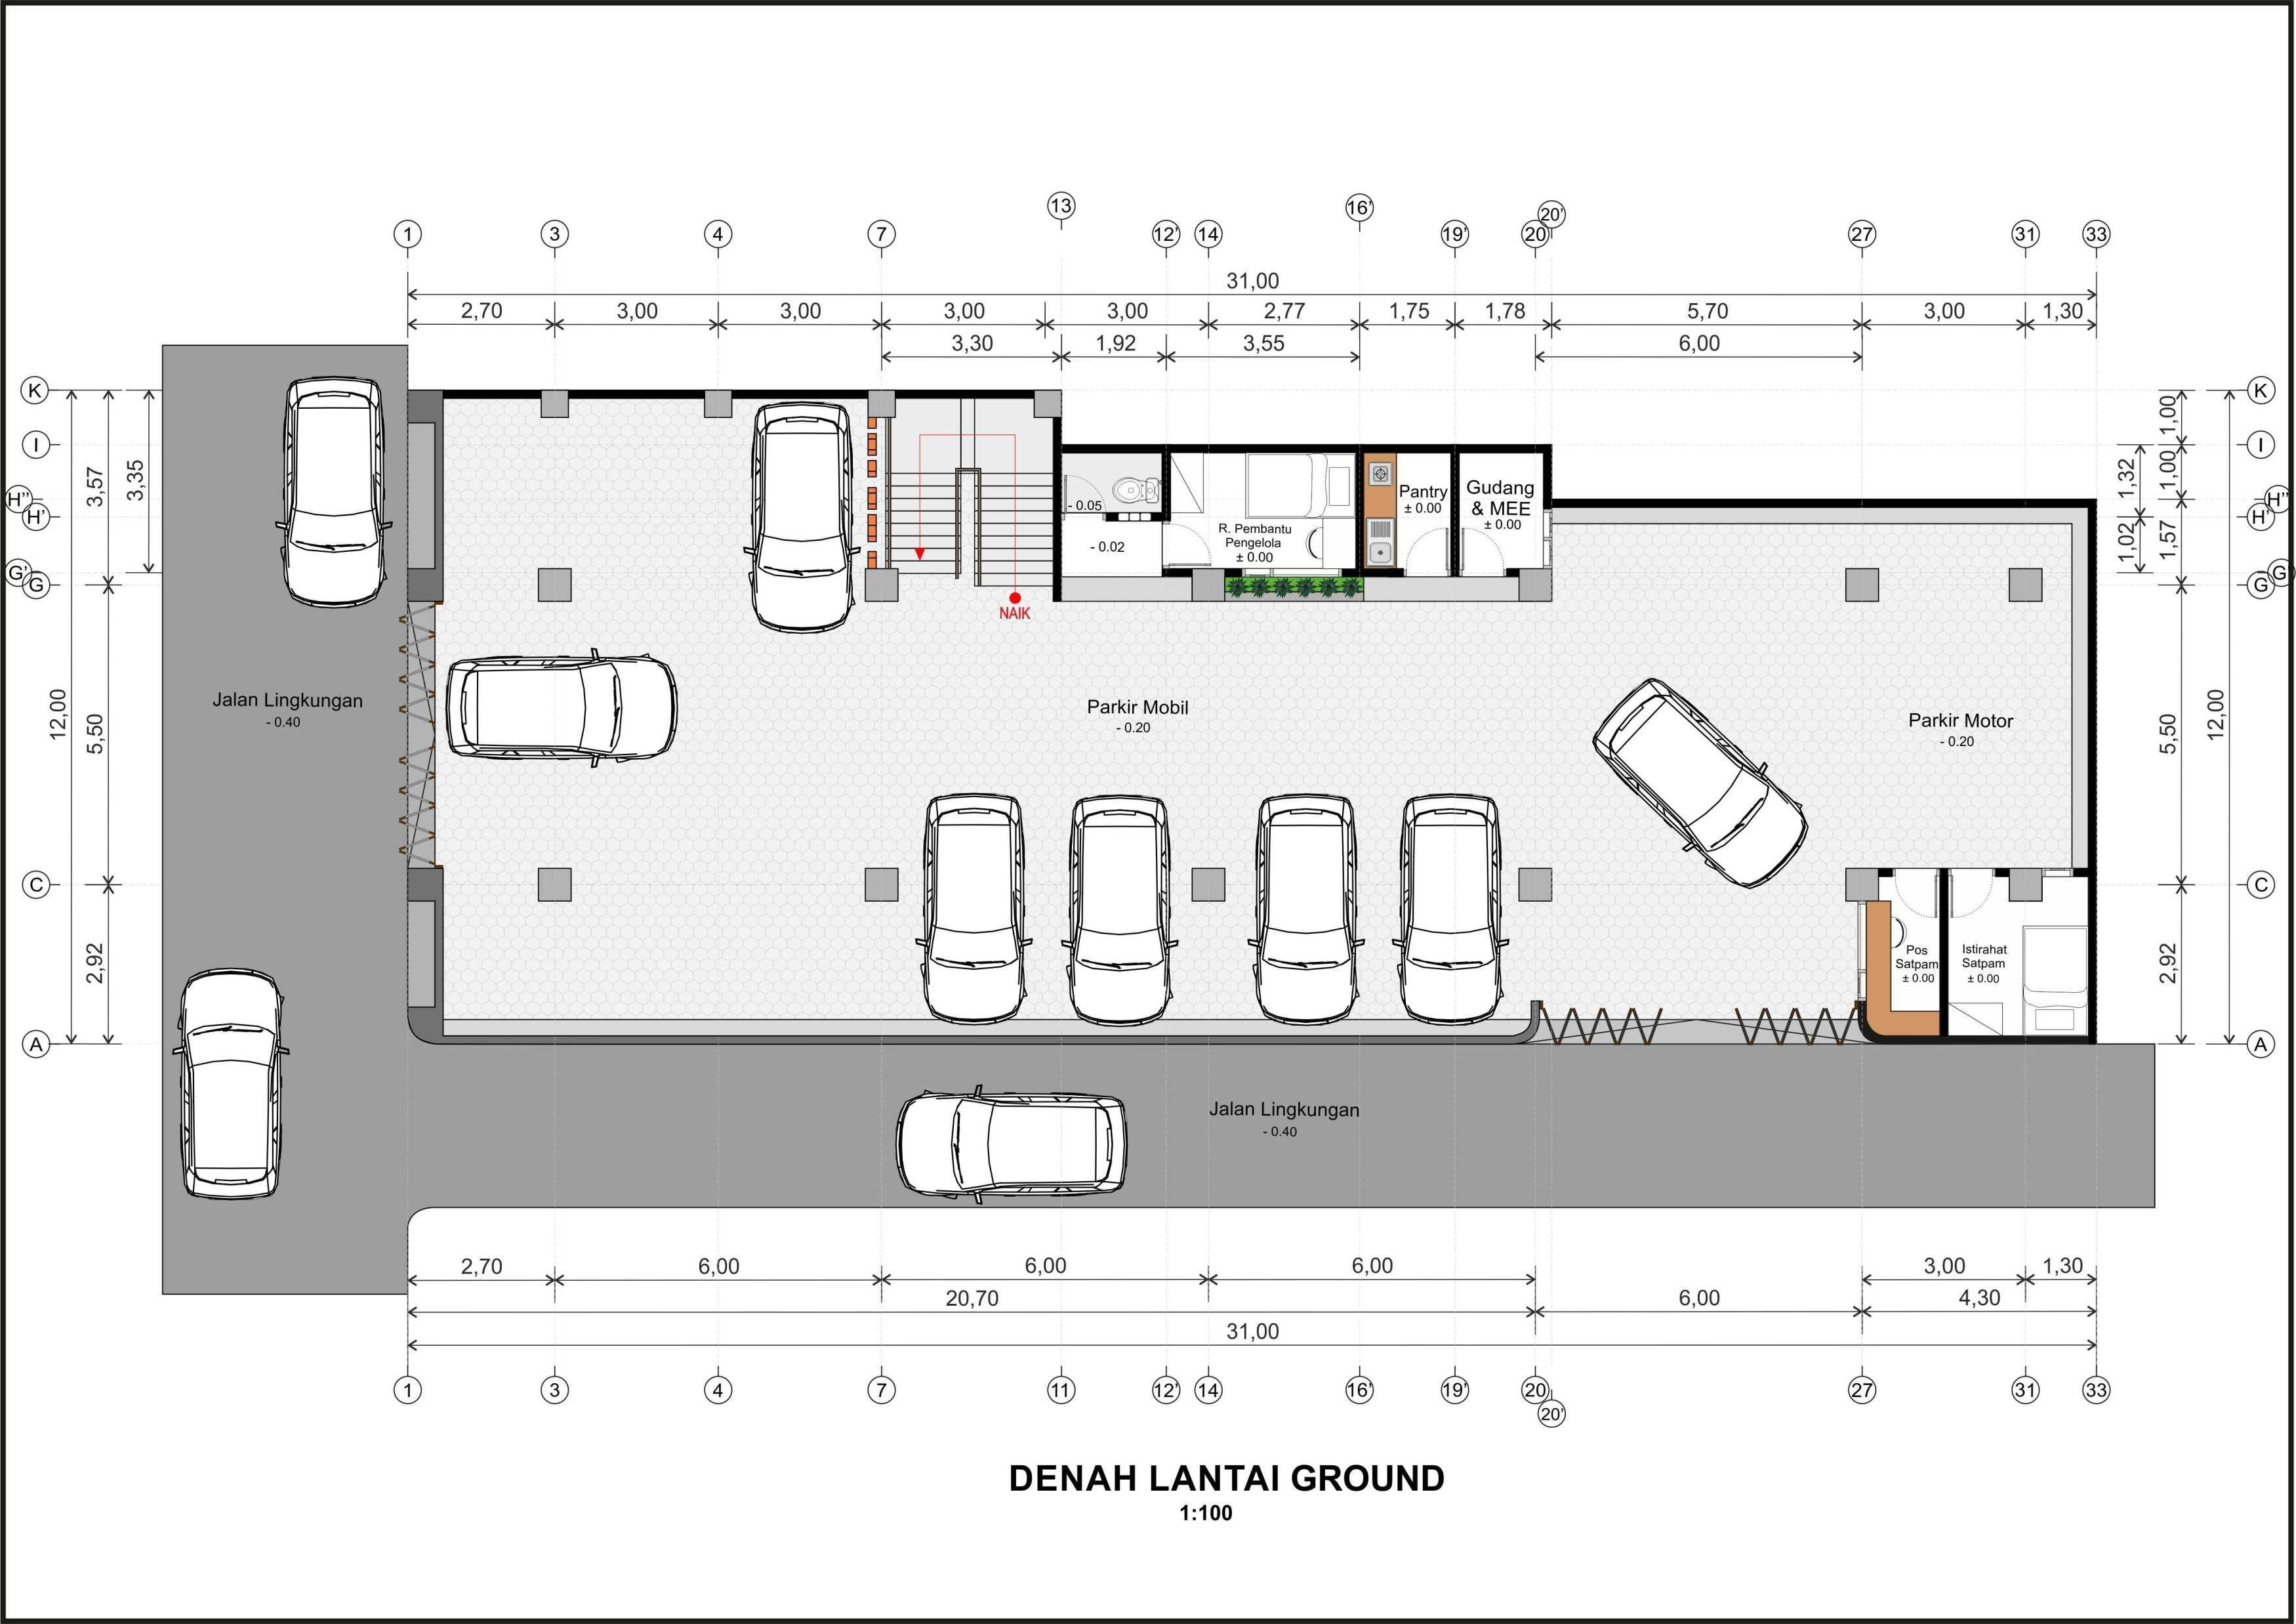 Hendra Budi Architect Wisma Sarjana Yogyakarta Yogyakarta Denah-Ground   16373